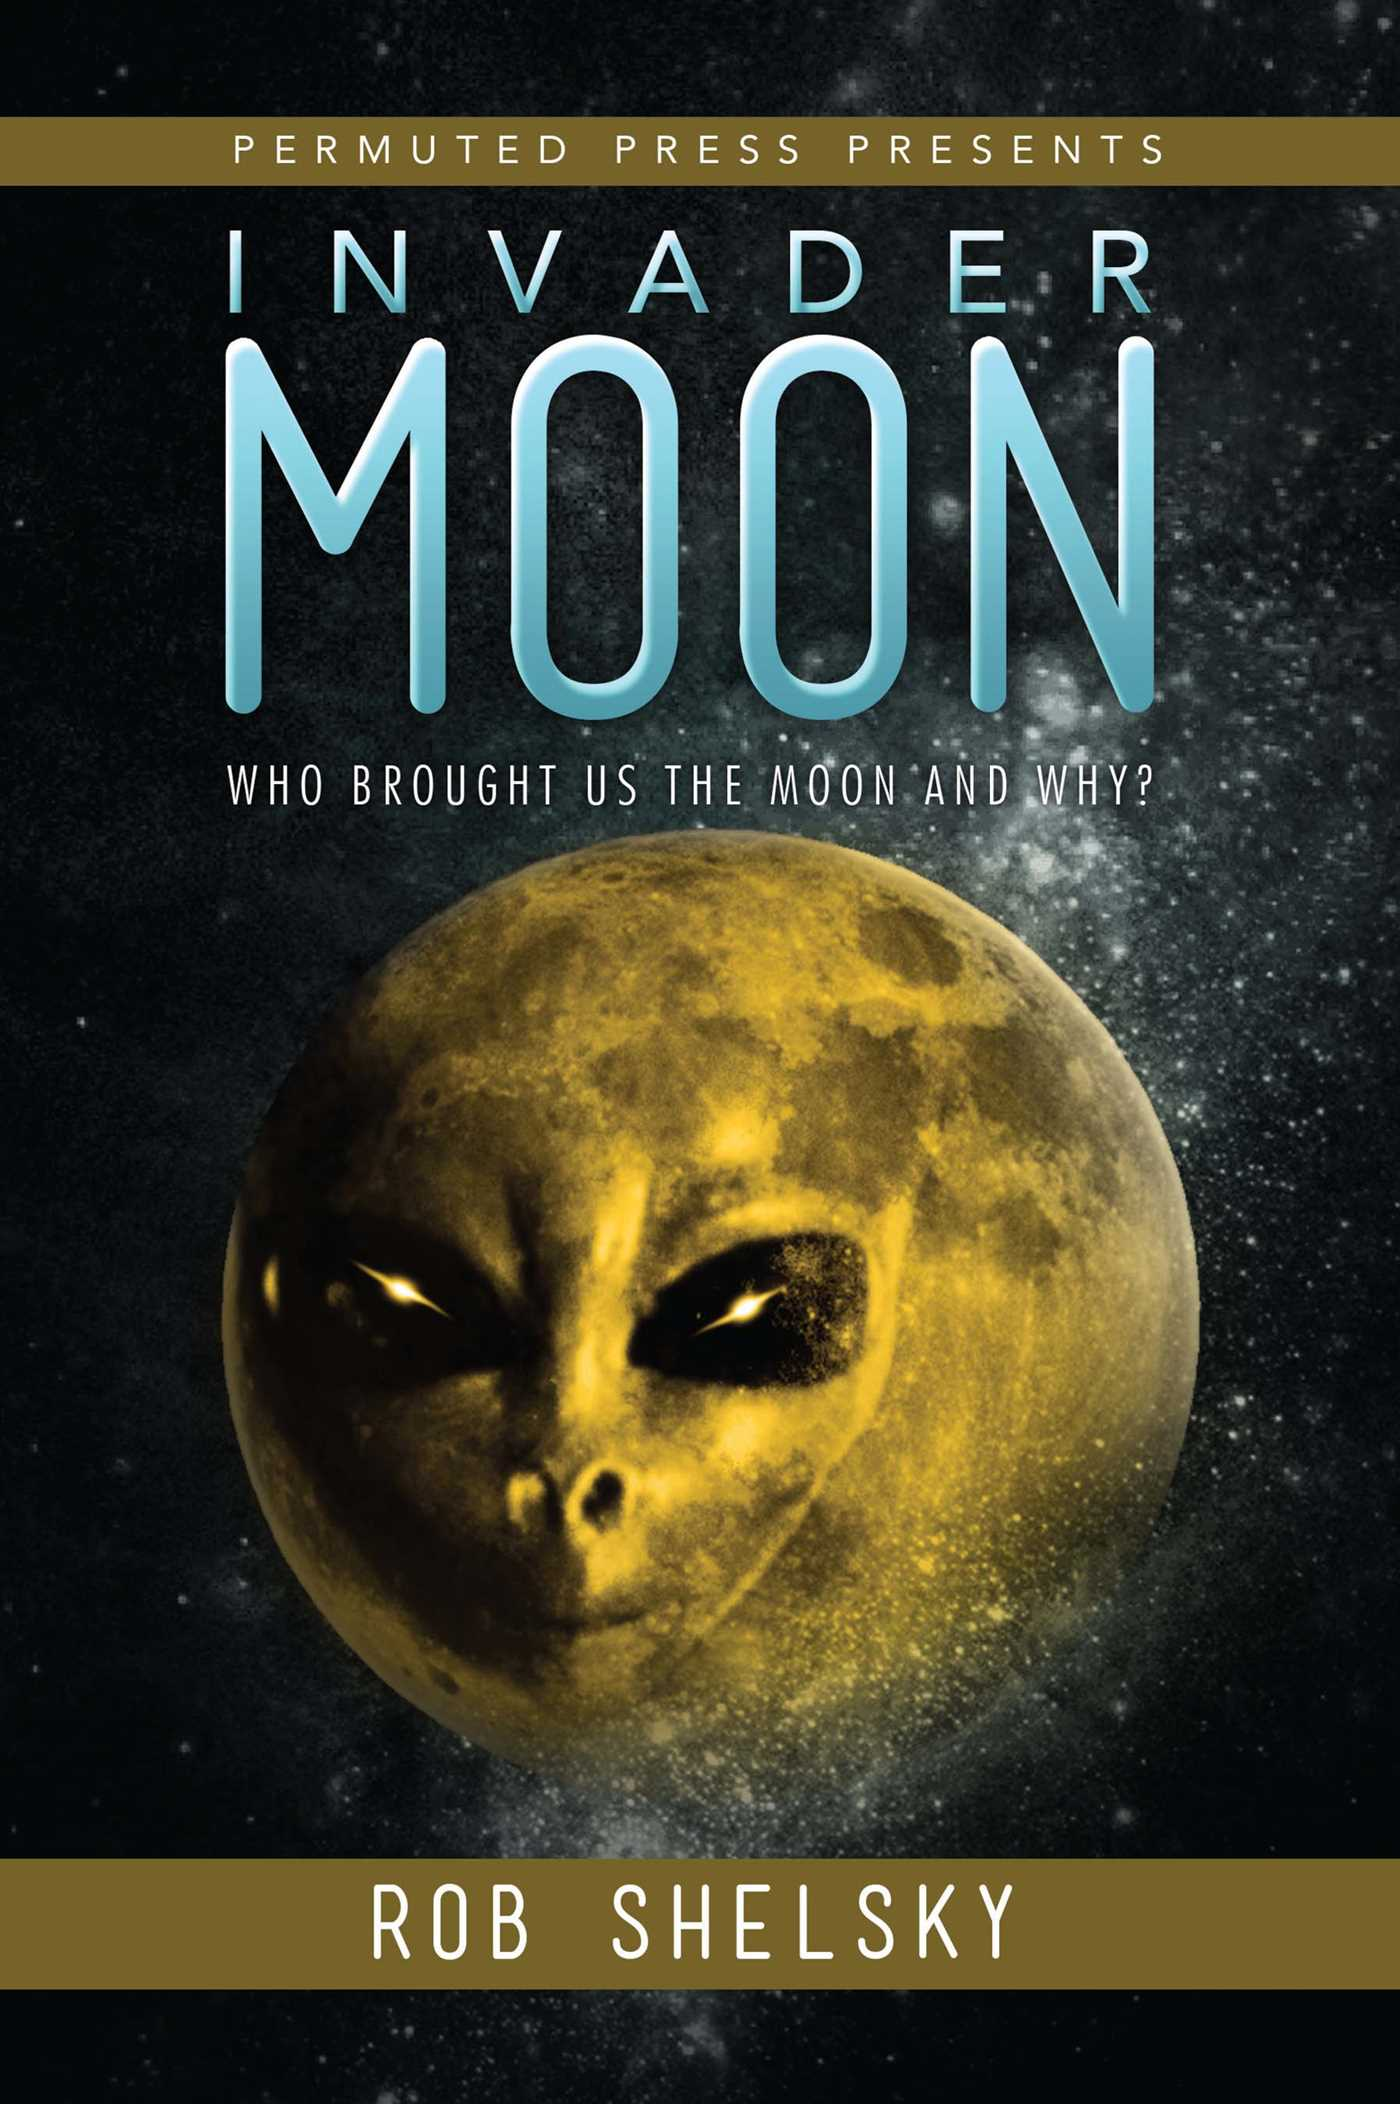 Invader moon 9781618686664 hr